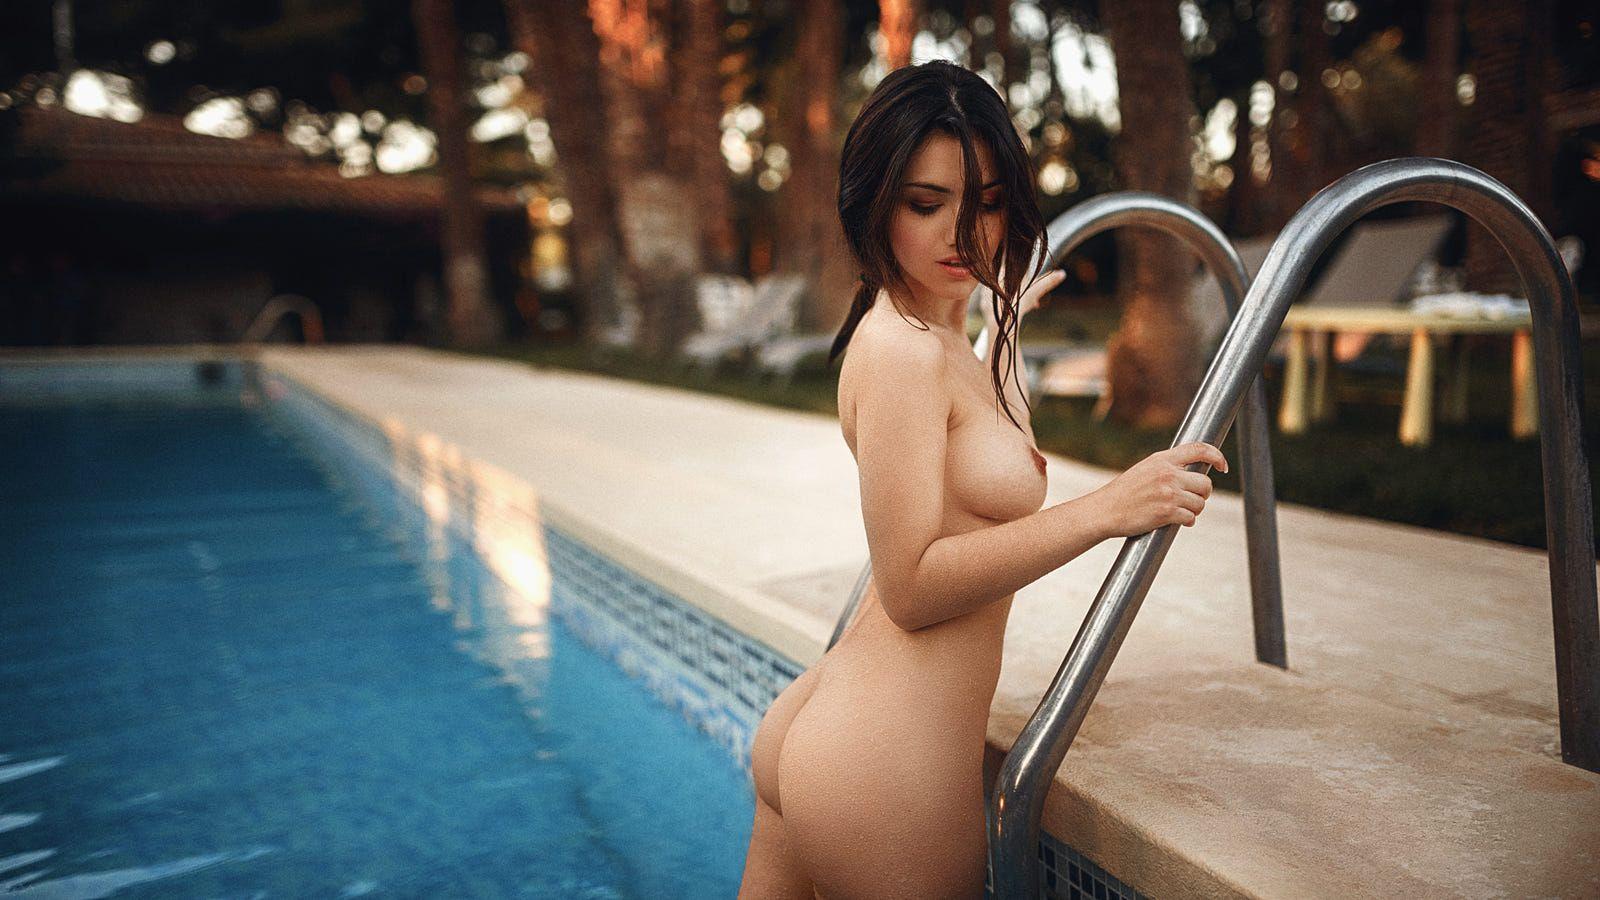 Pics Delaia Gonzalez nude (11 photo), Topless, Sideboobs, Feet, see through 2019